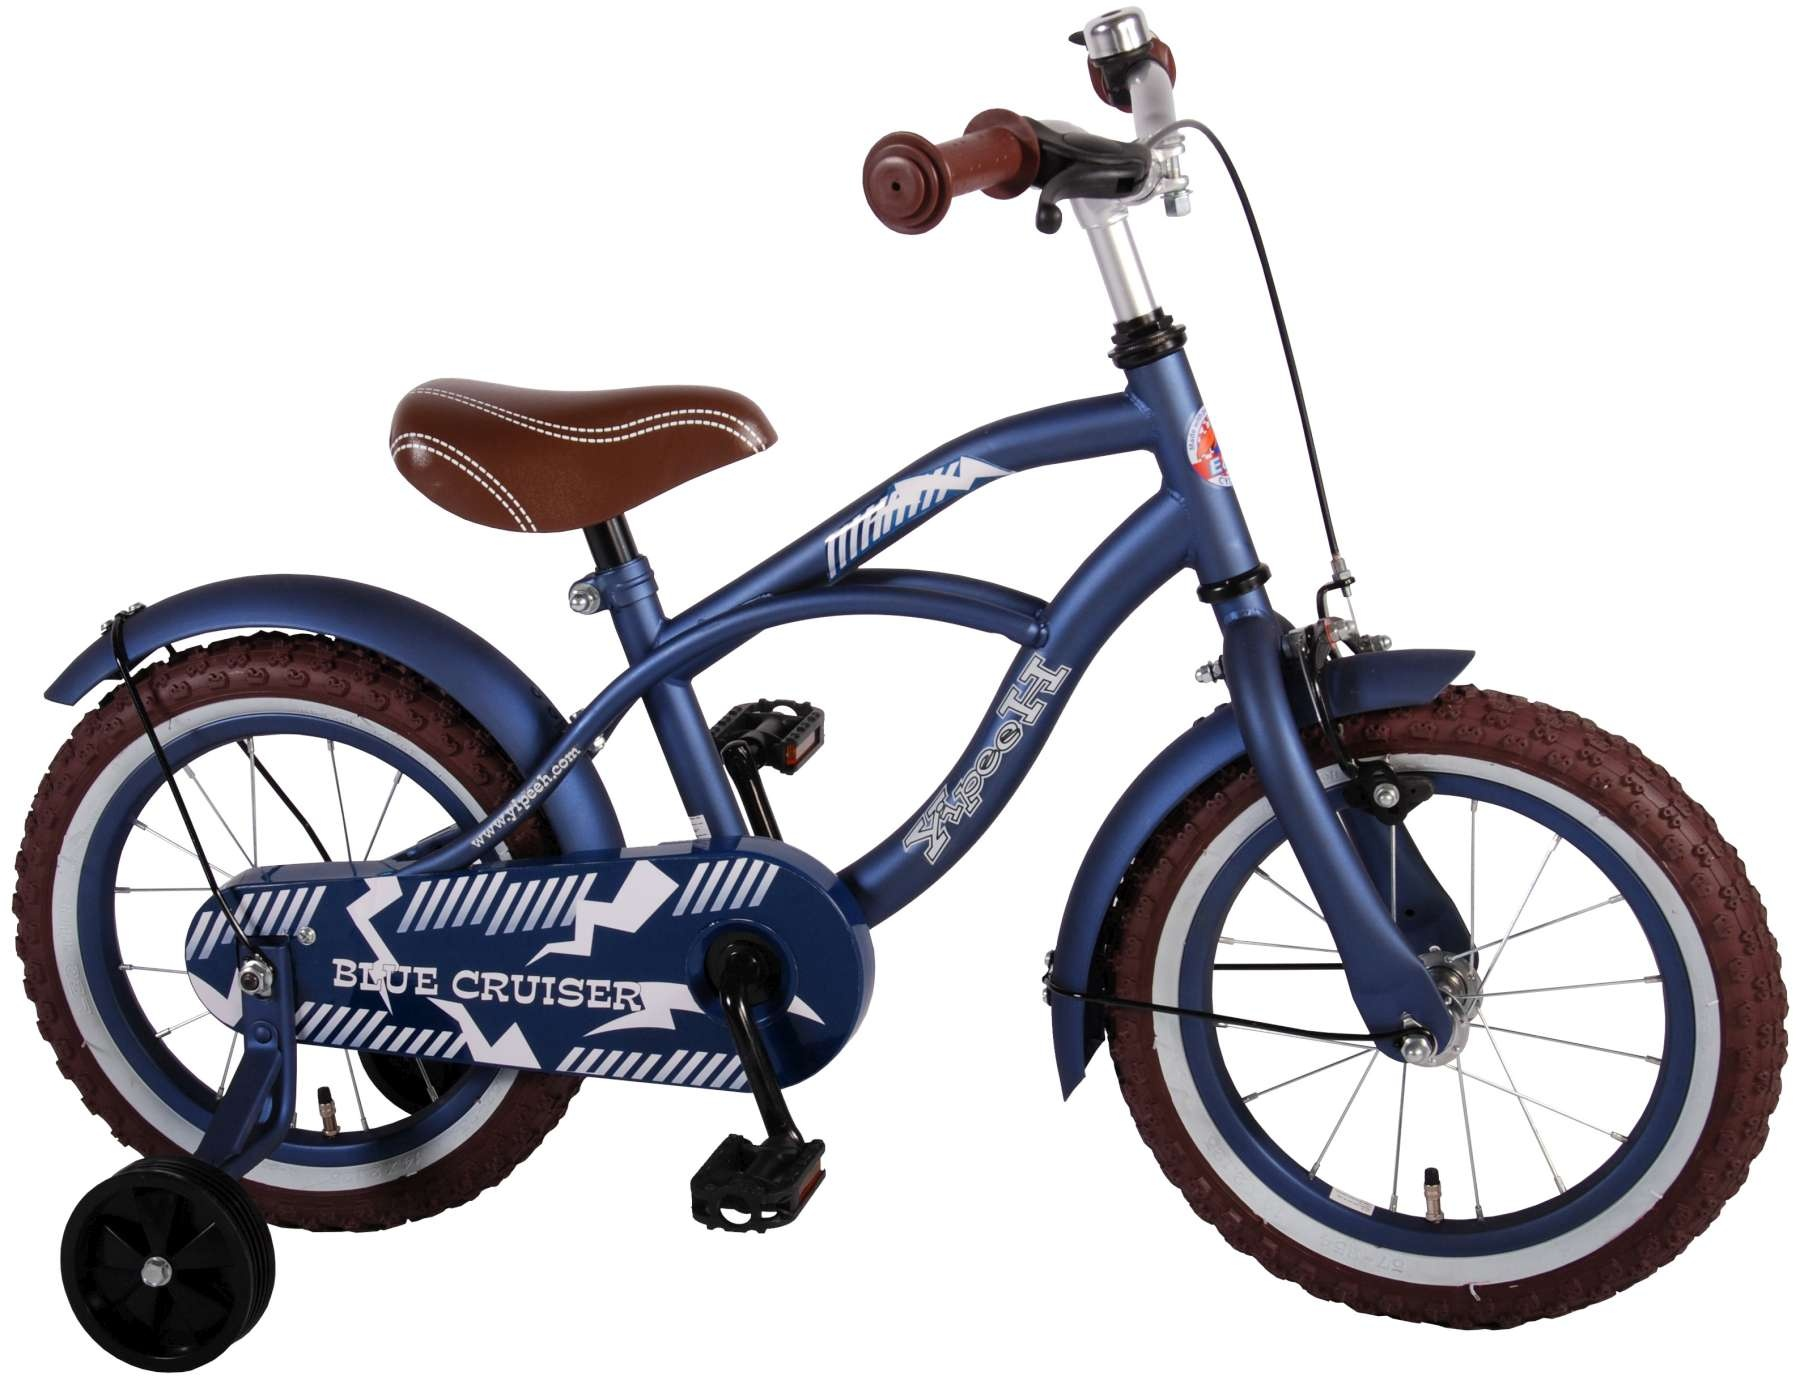 yipeeh blue cruiser 14 zoll 23 5 cm jungen r cktrittbremse. Black Bedroom Furniture Sets. Home Design Ideas